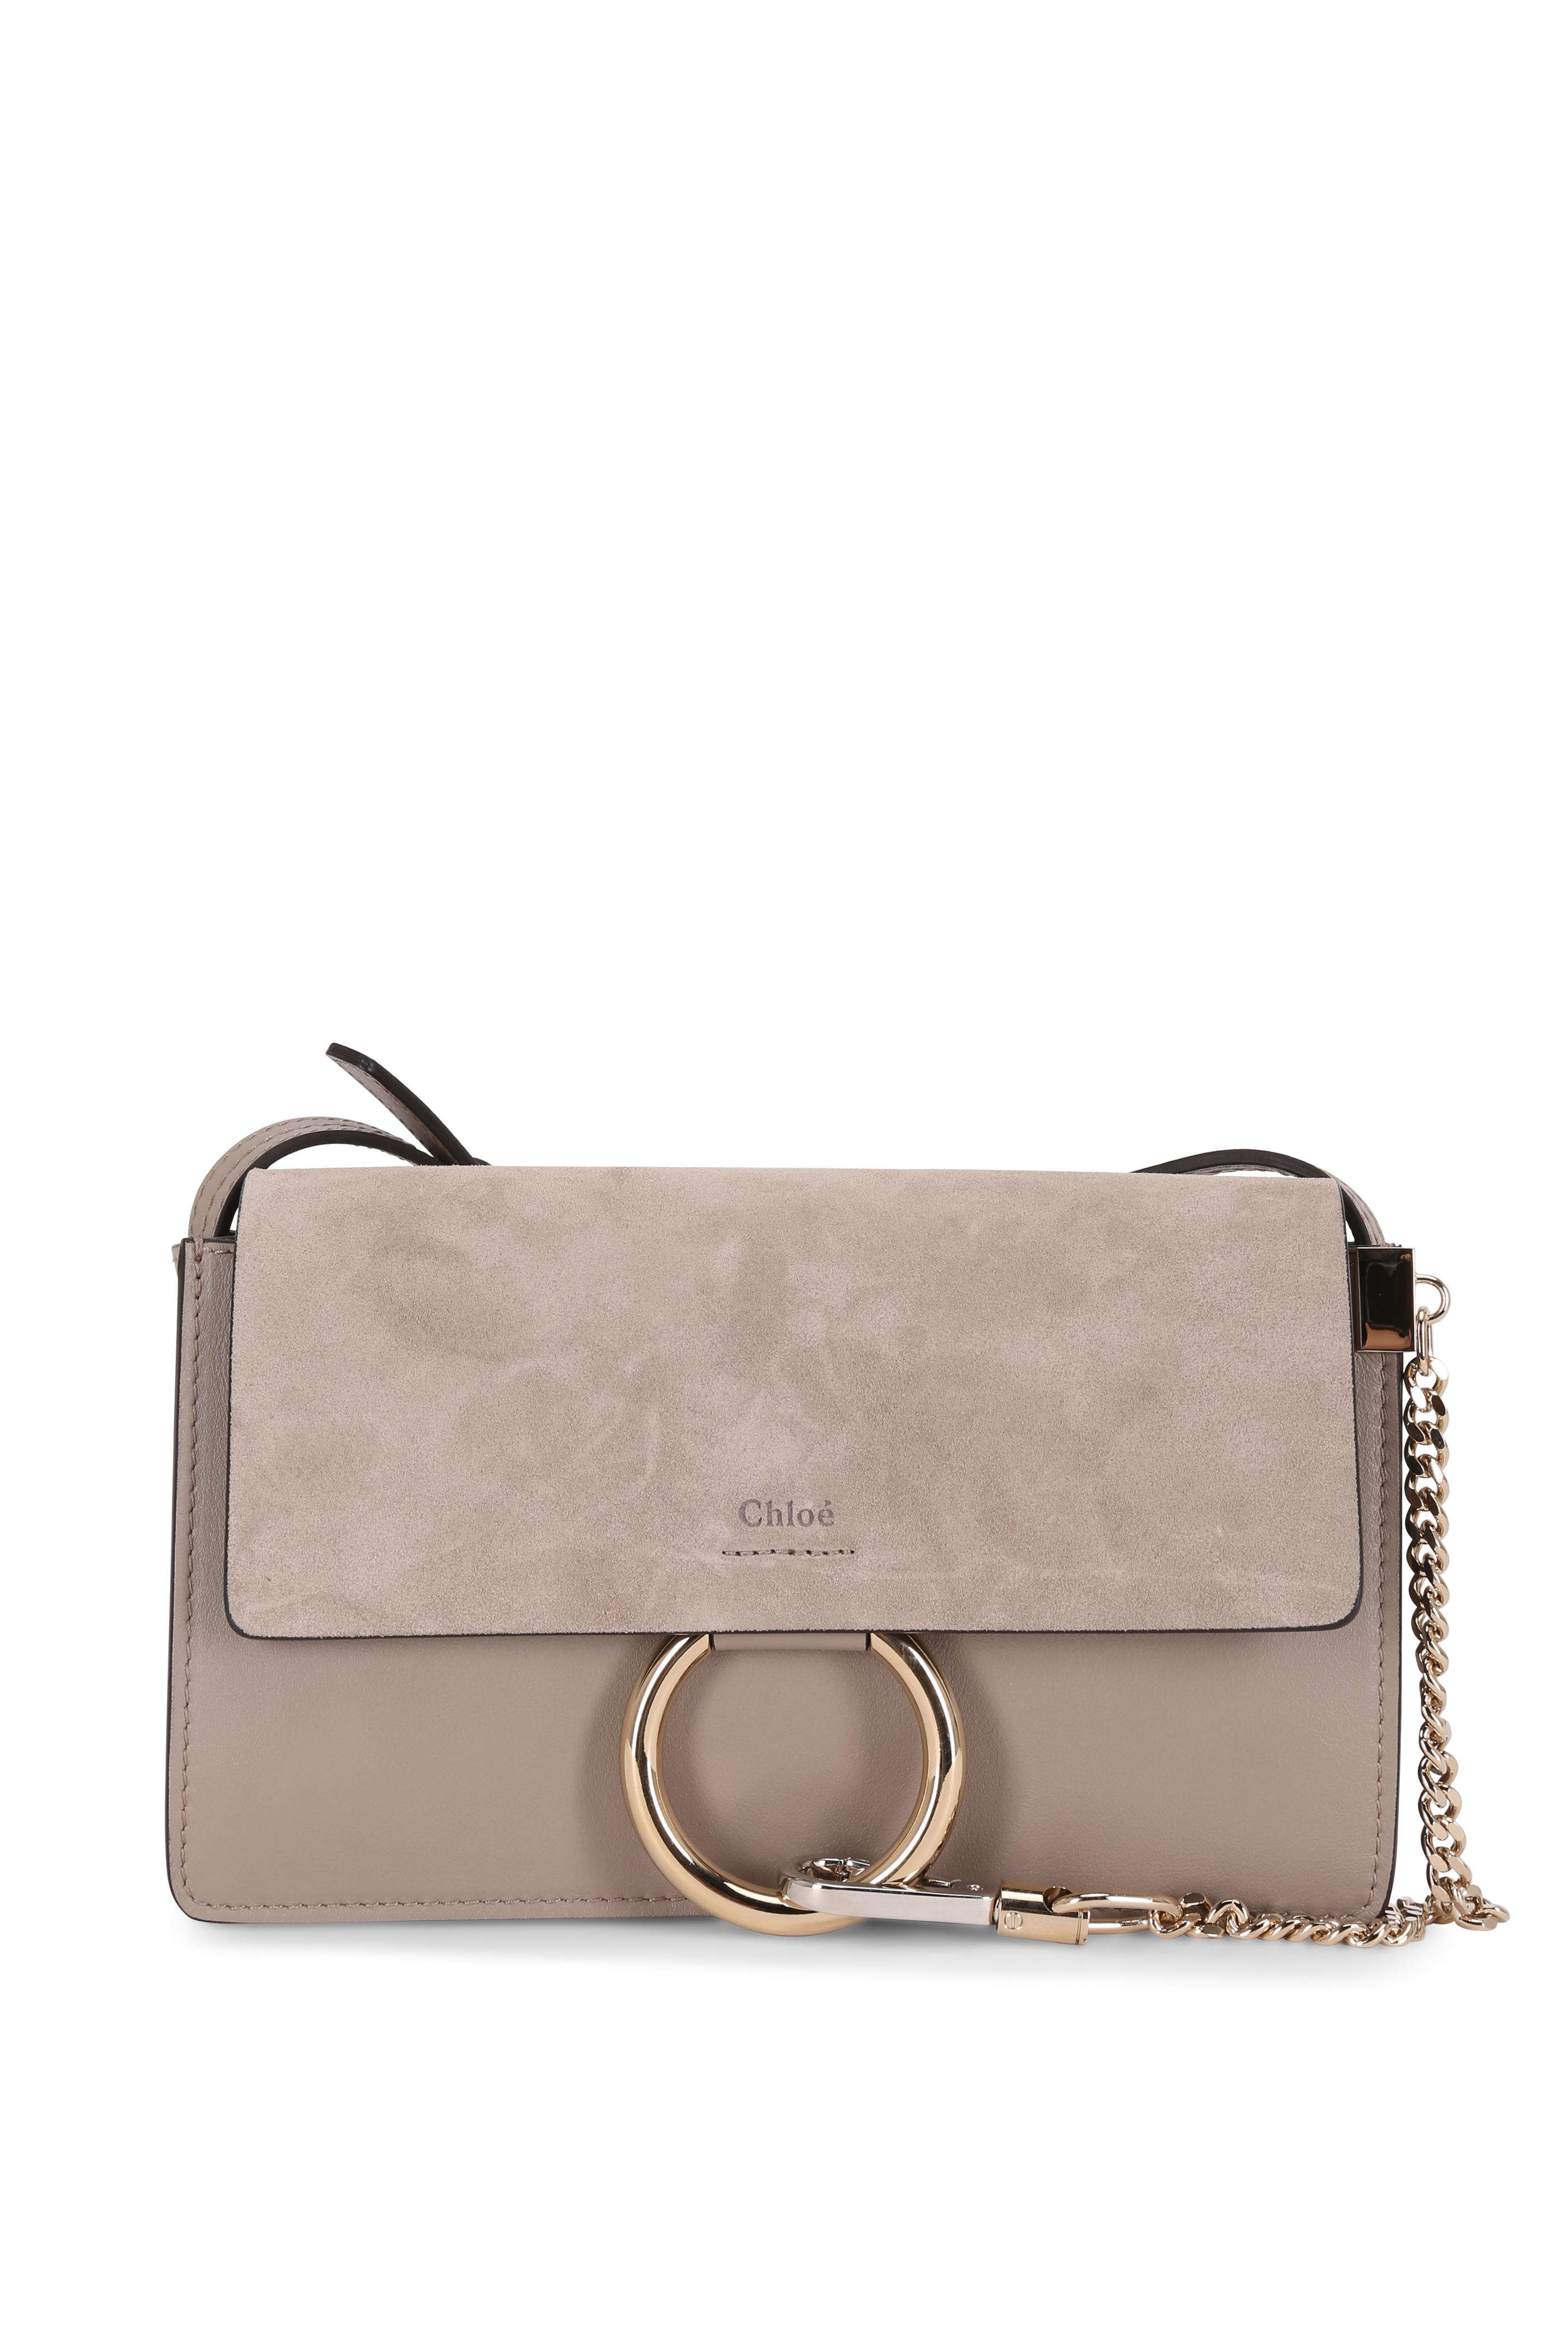 7dec7c1eff Chloé - Faye Motty Gray Leather & Suede Small Shoulder Bag ...